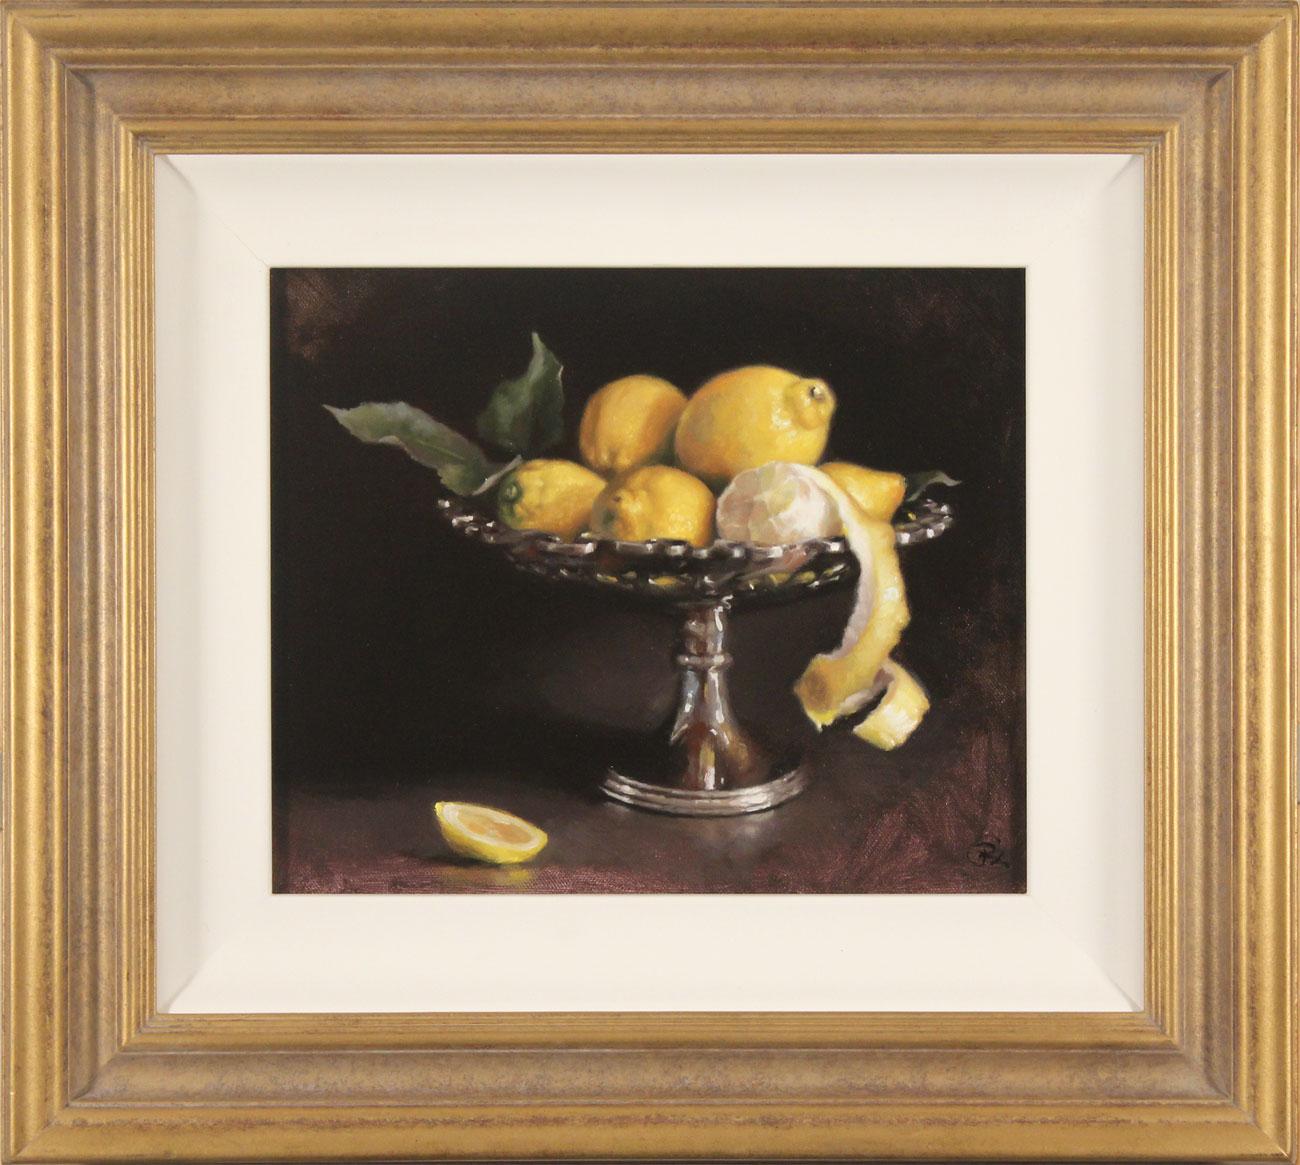 Caroline Richardson, Original oil painting on canvas, Lemons, click to enlarge